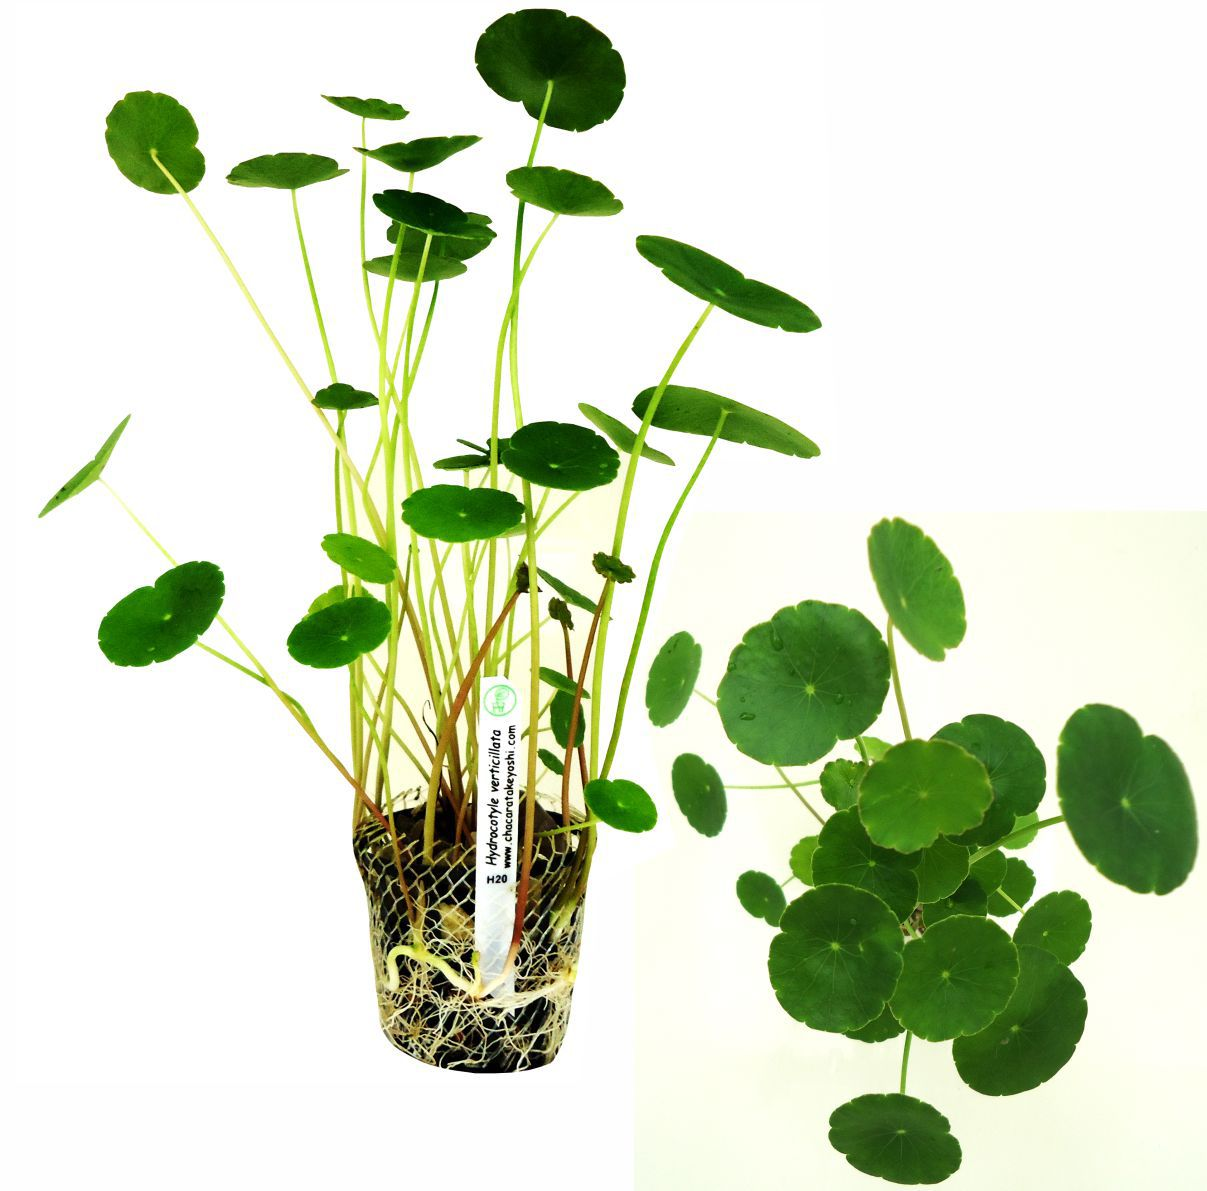 Planta Hydrocotyle verticillata